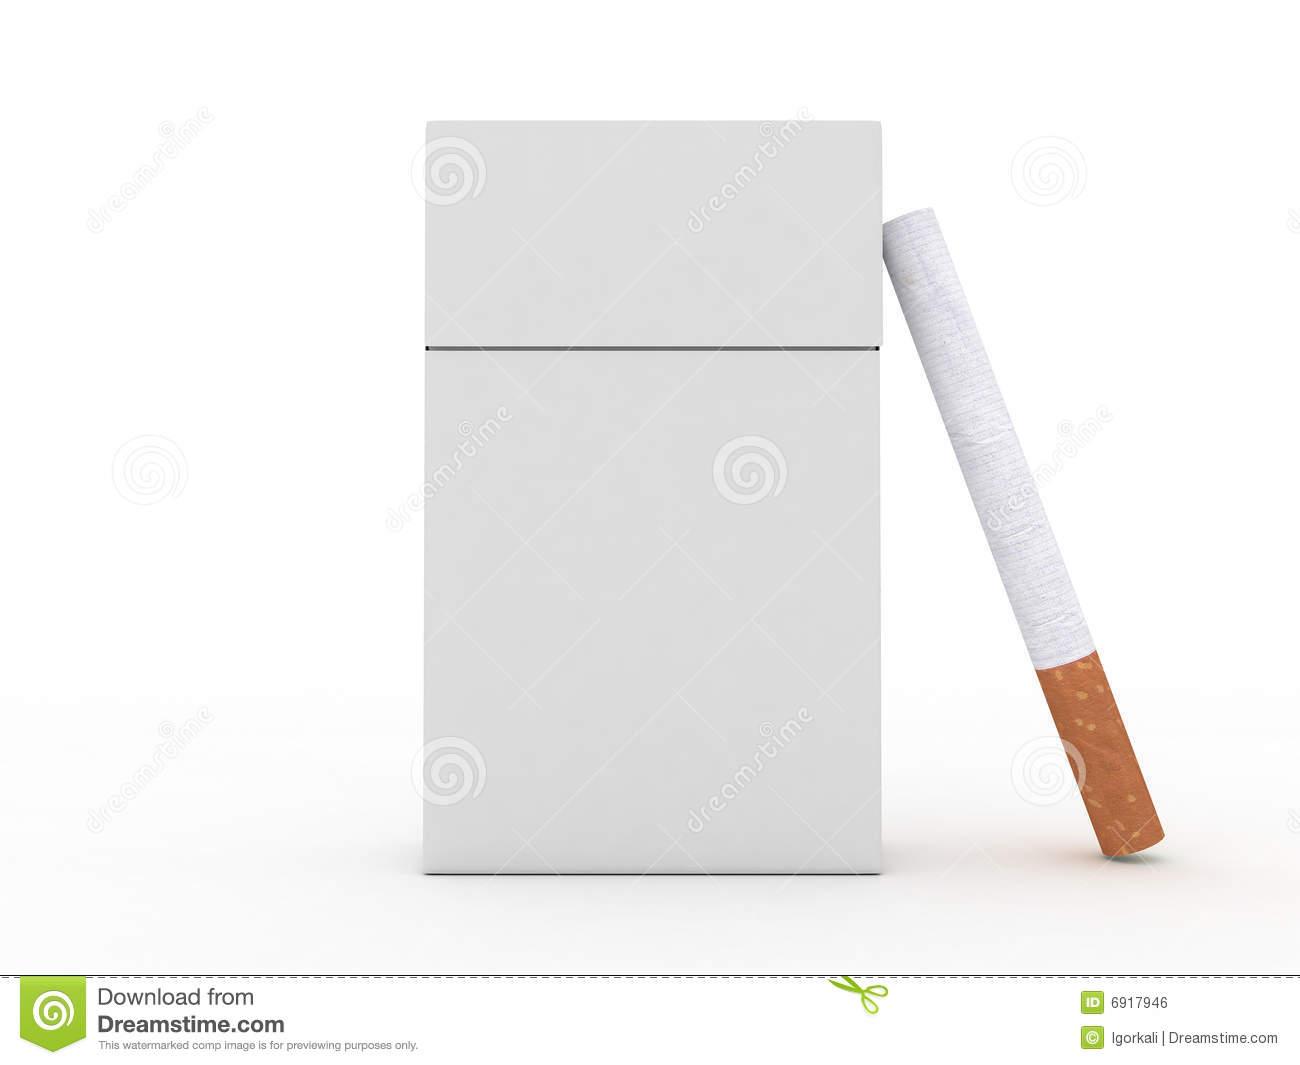 Cigarette Pack Clipart - Clipart Kid